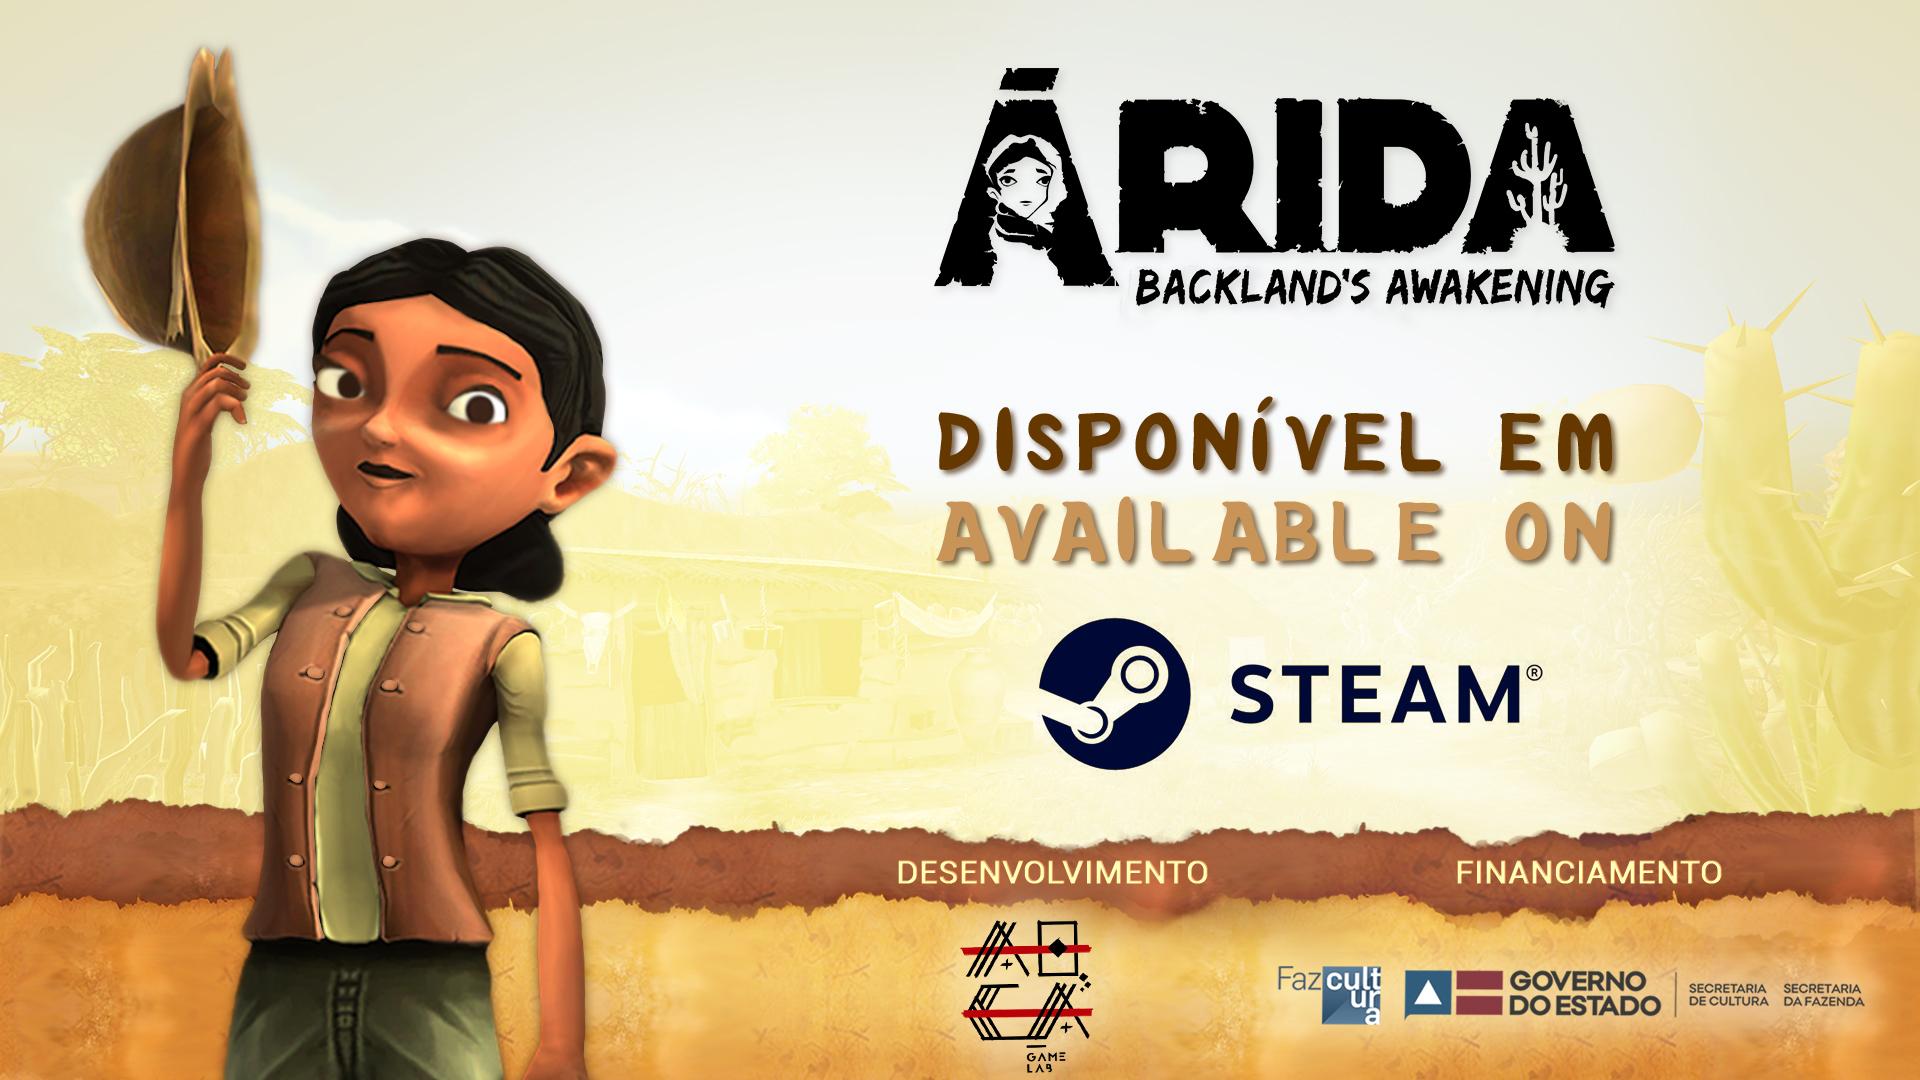 Arida: Backland's Awakening - Release! news - Mod DB